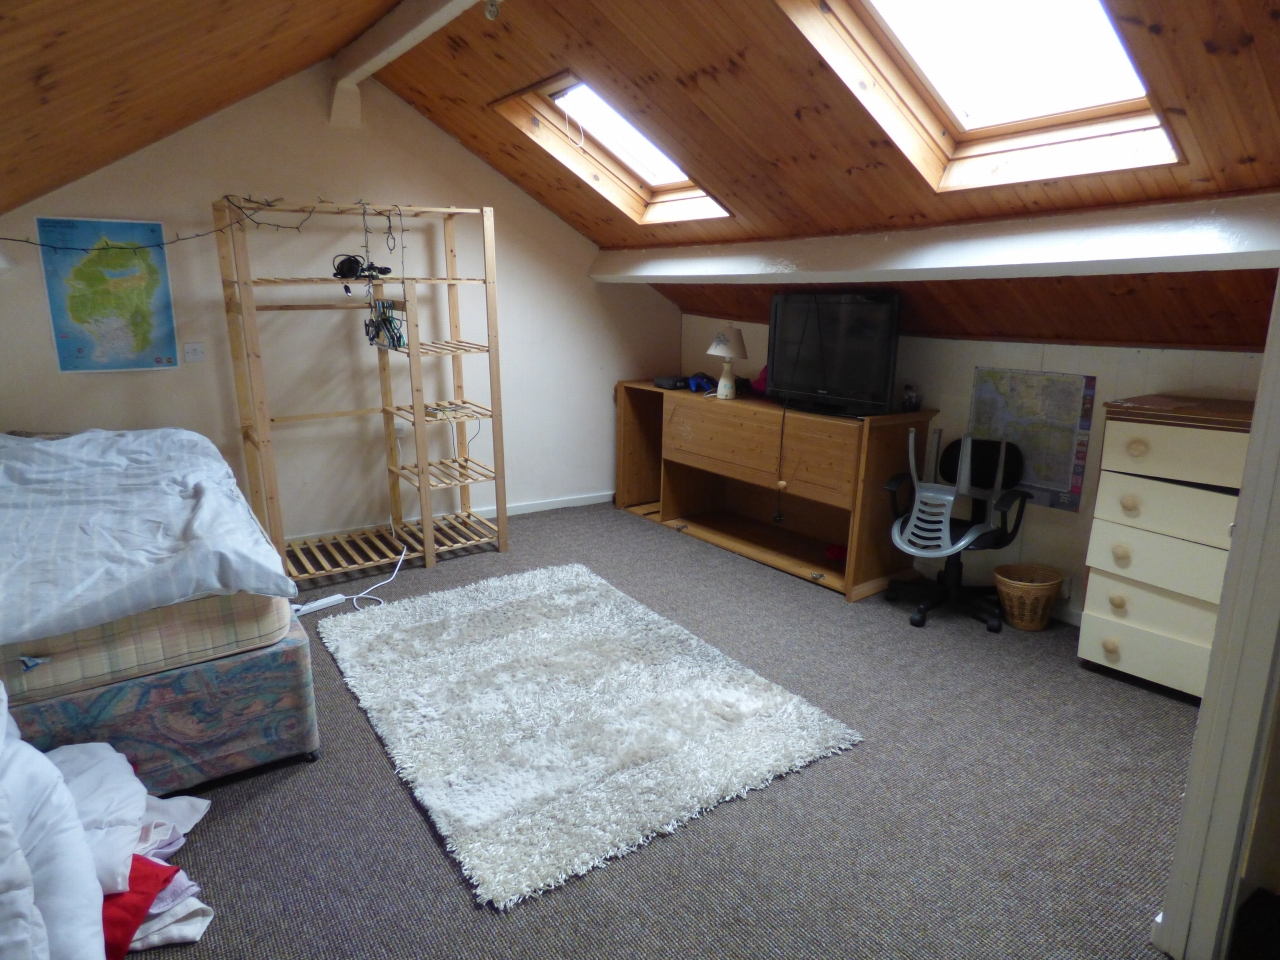 2 Bedroom For Sale - 0